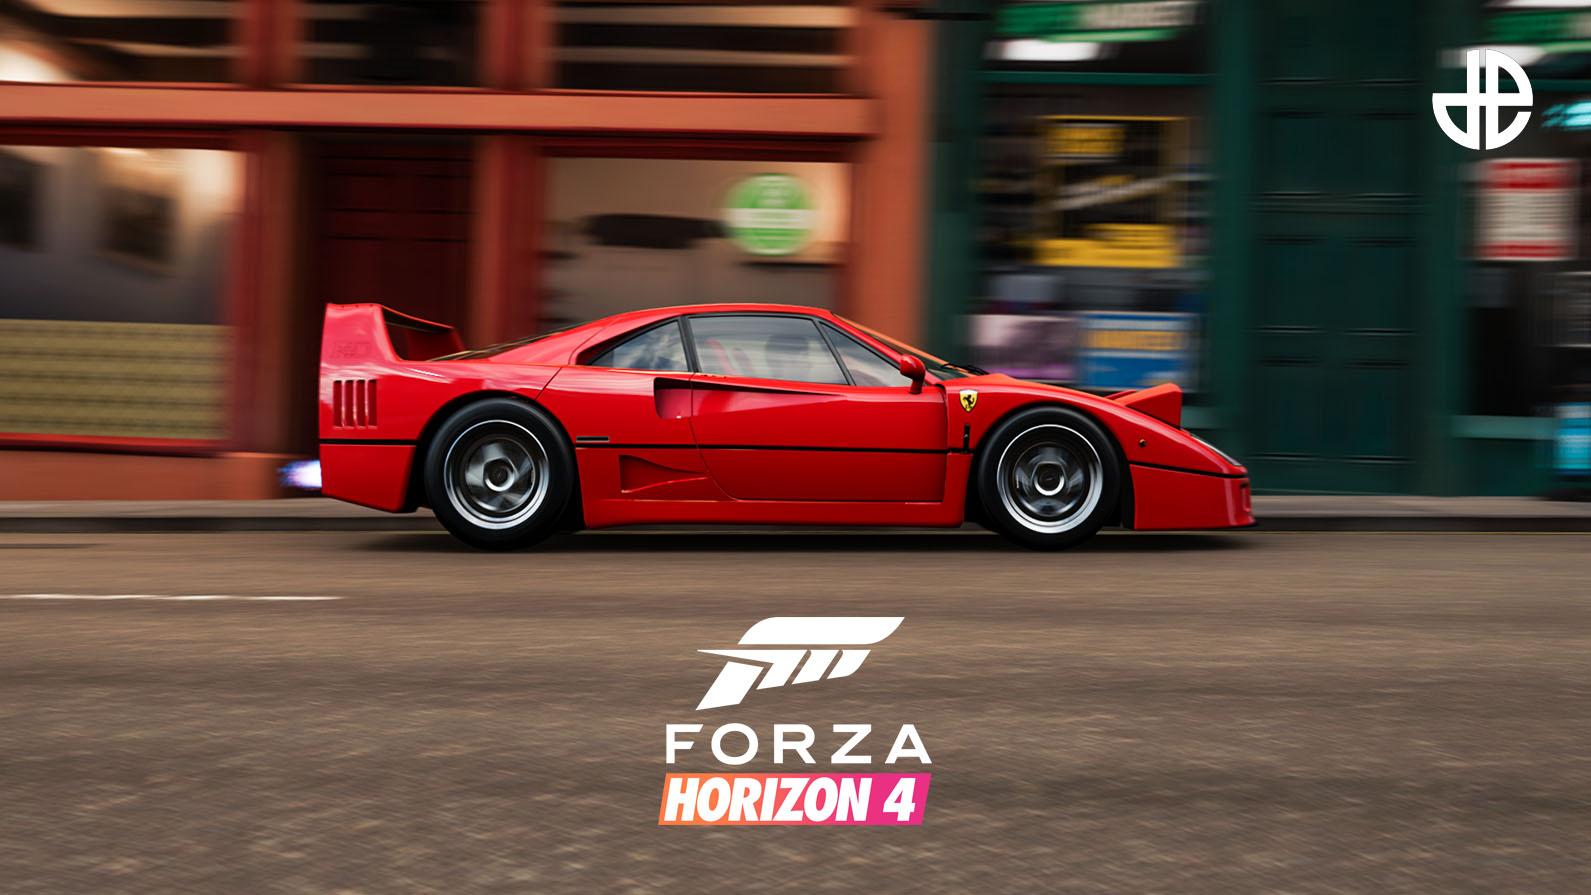 Forza Photo Mode Guide